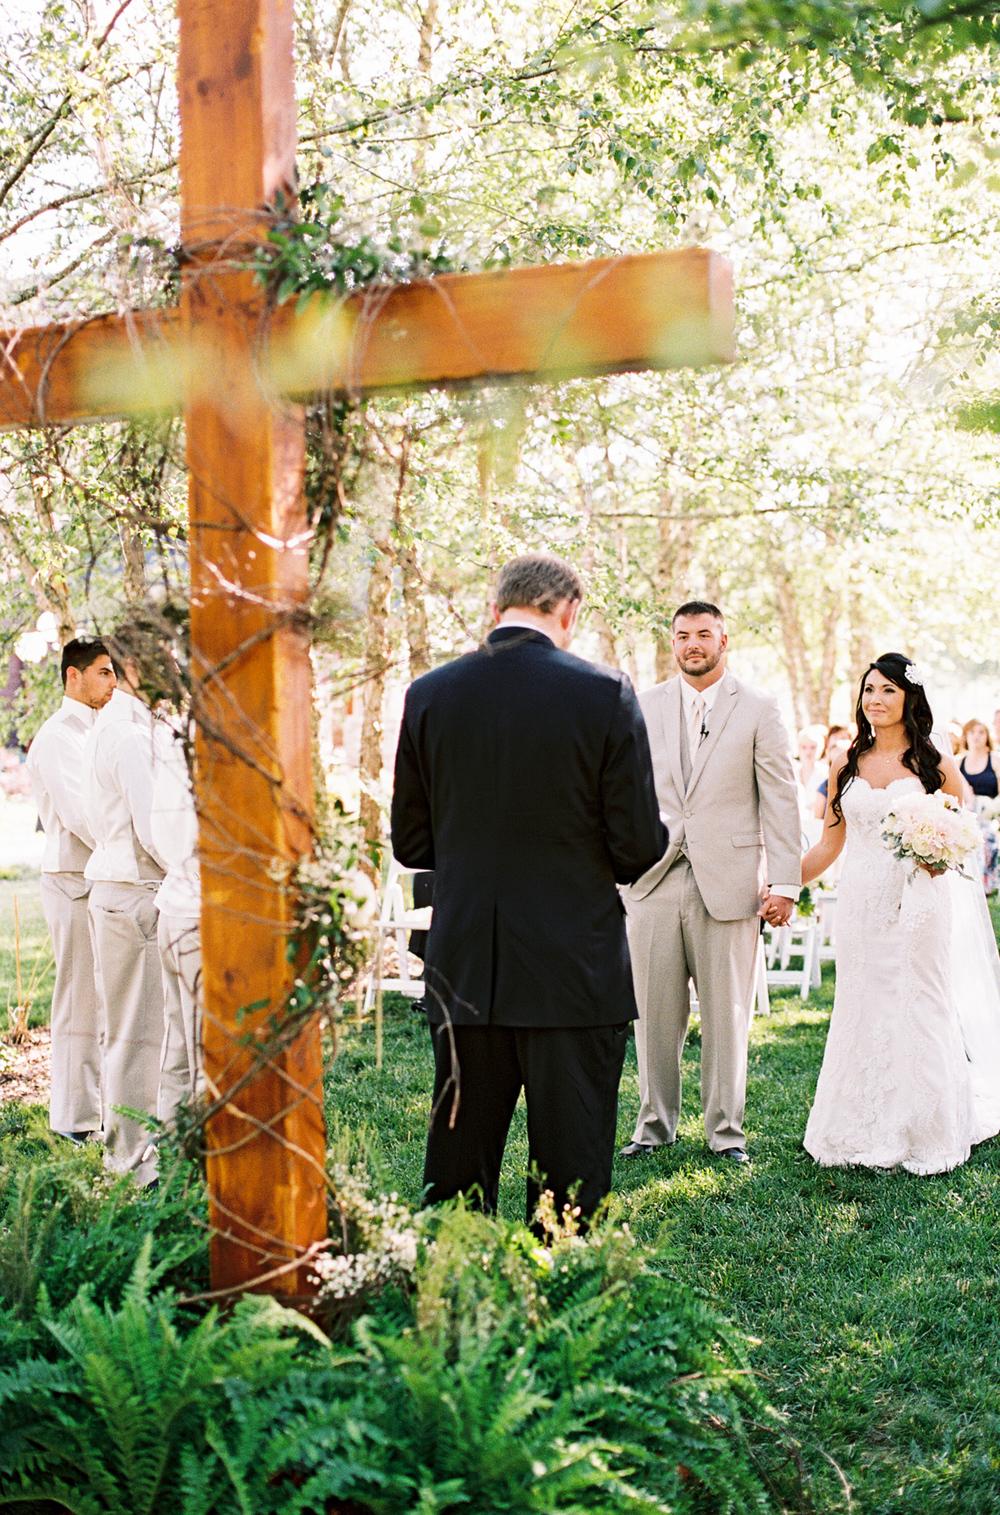 mcguires-millrace-farm-wedding-029.jpg